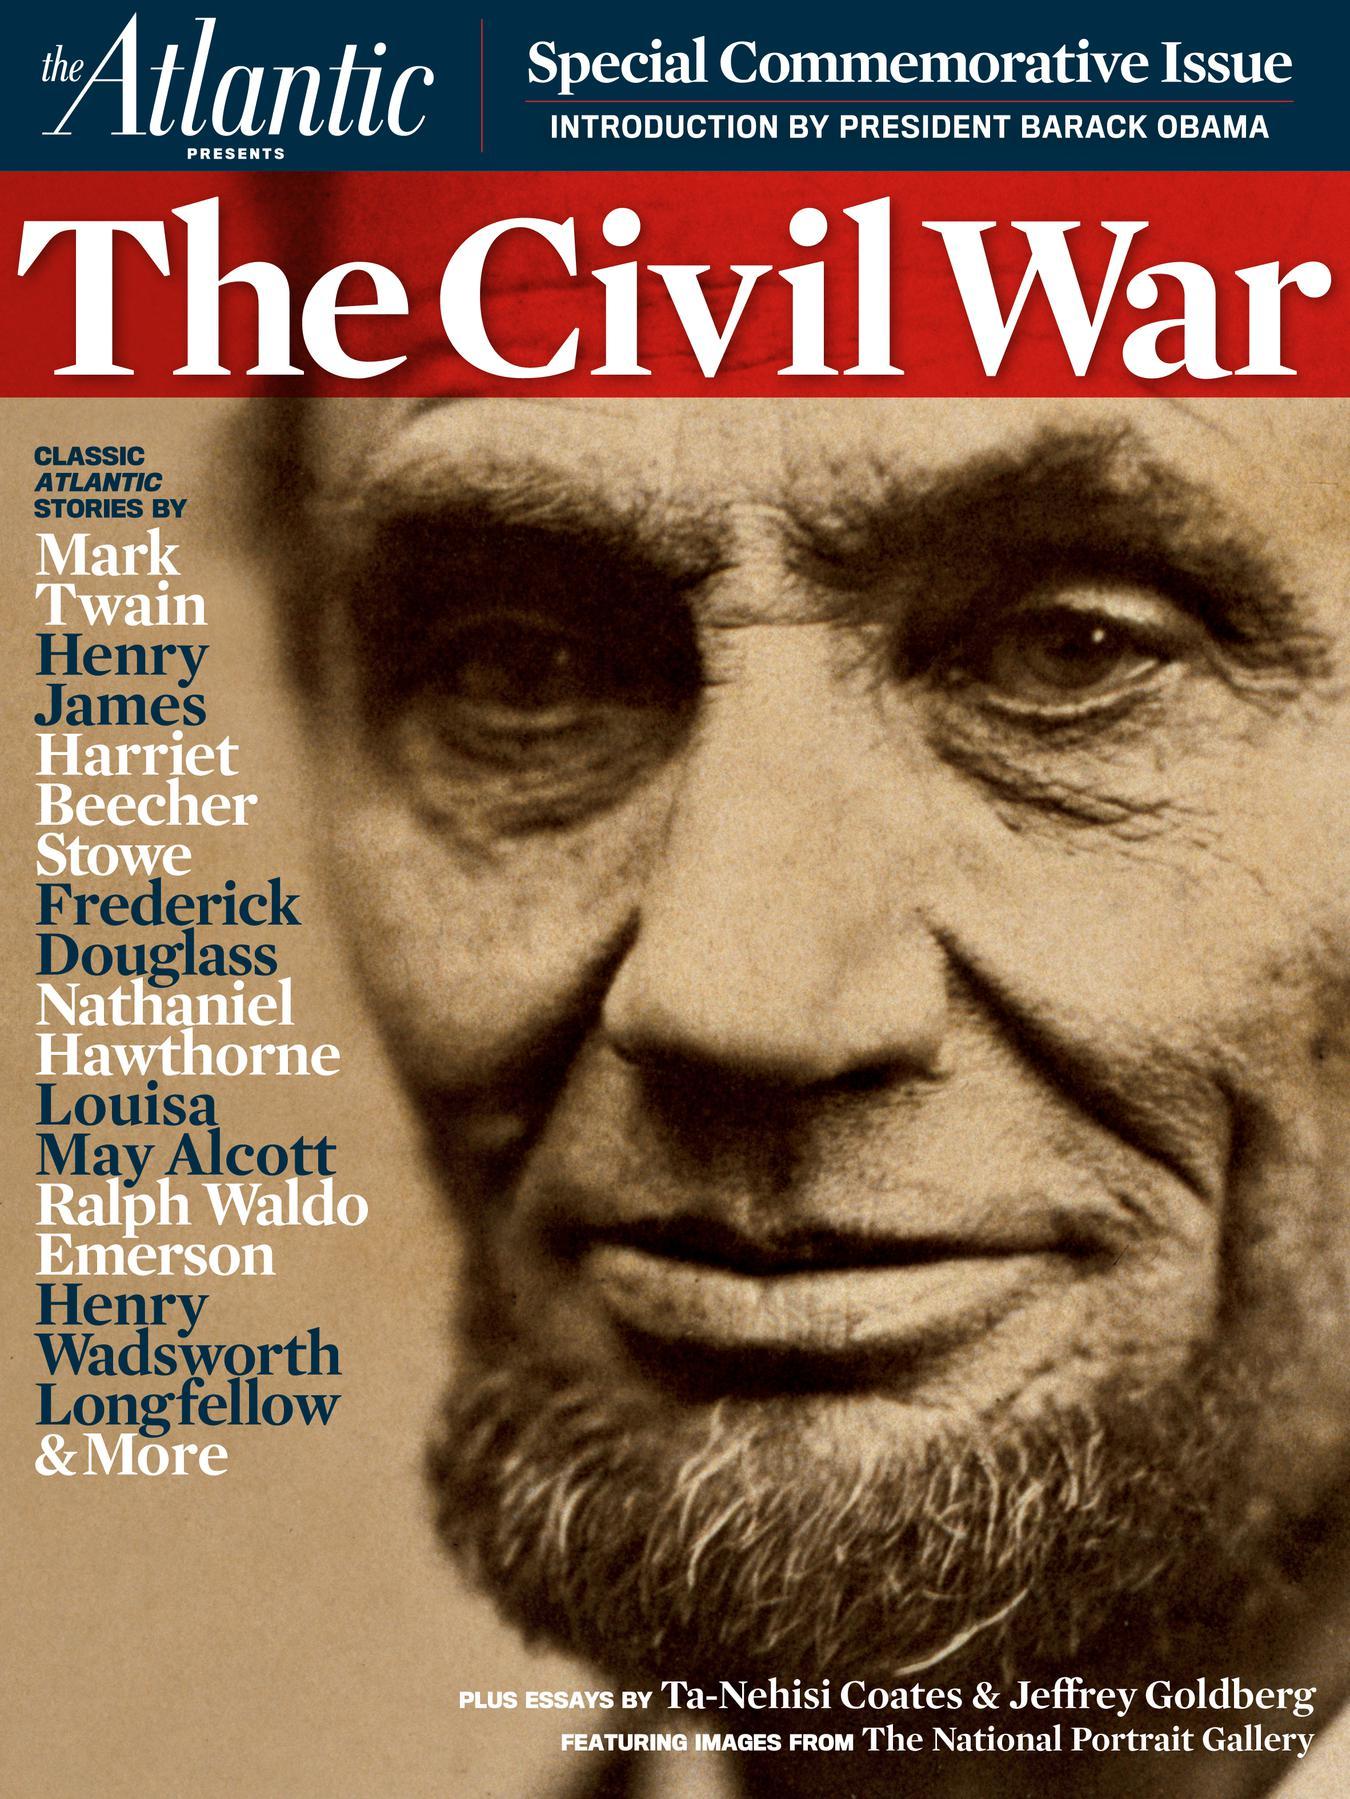 the civil war issue